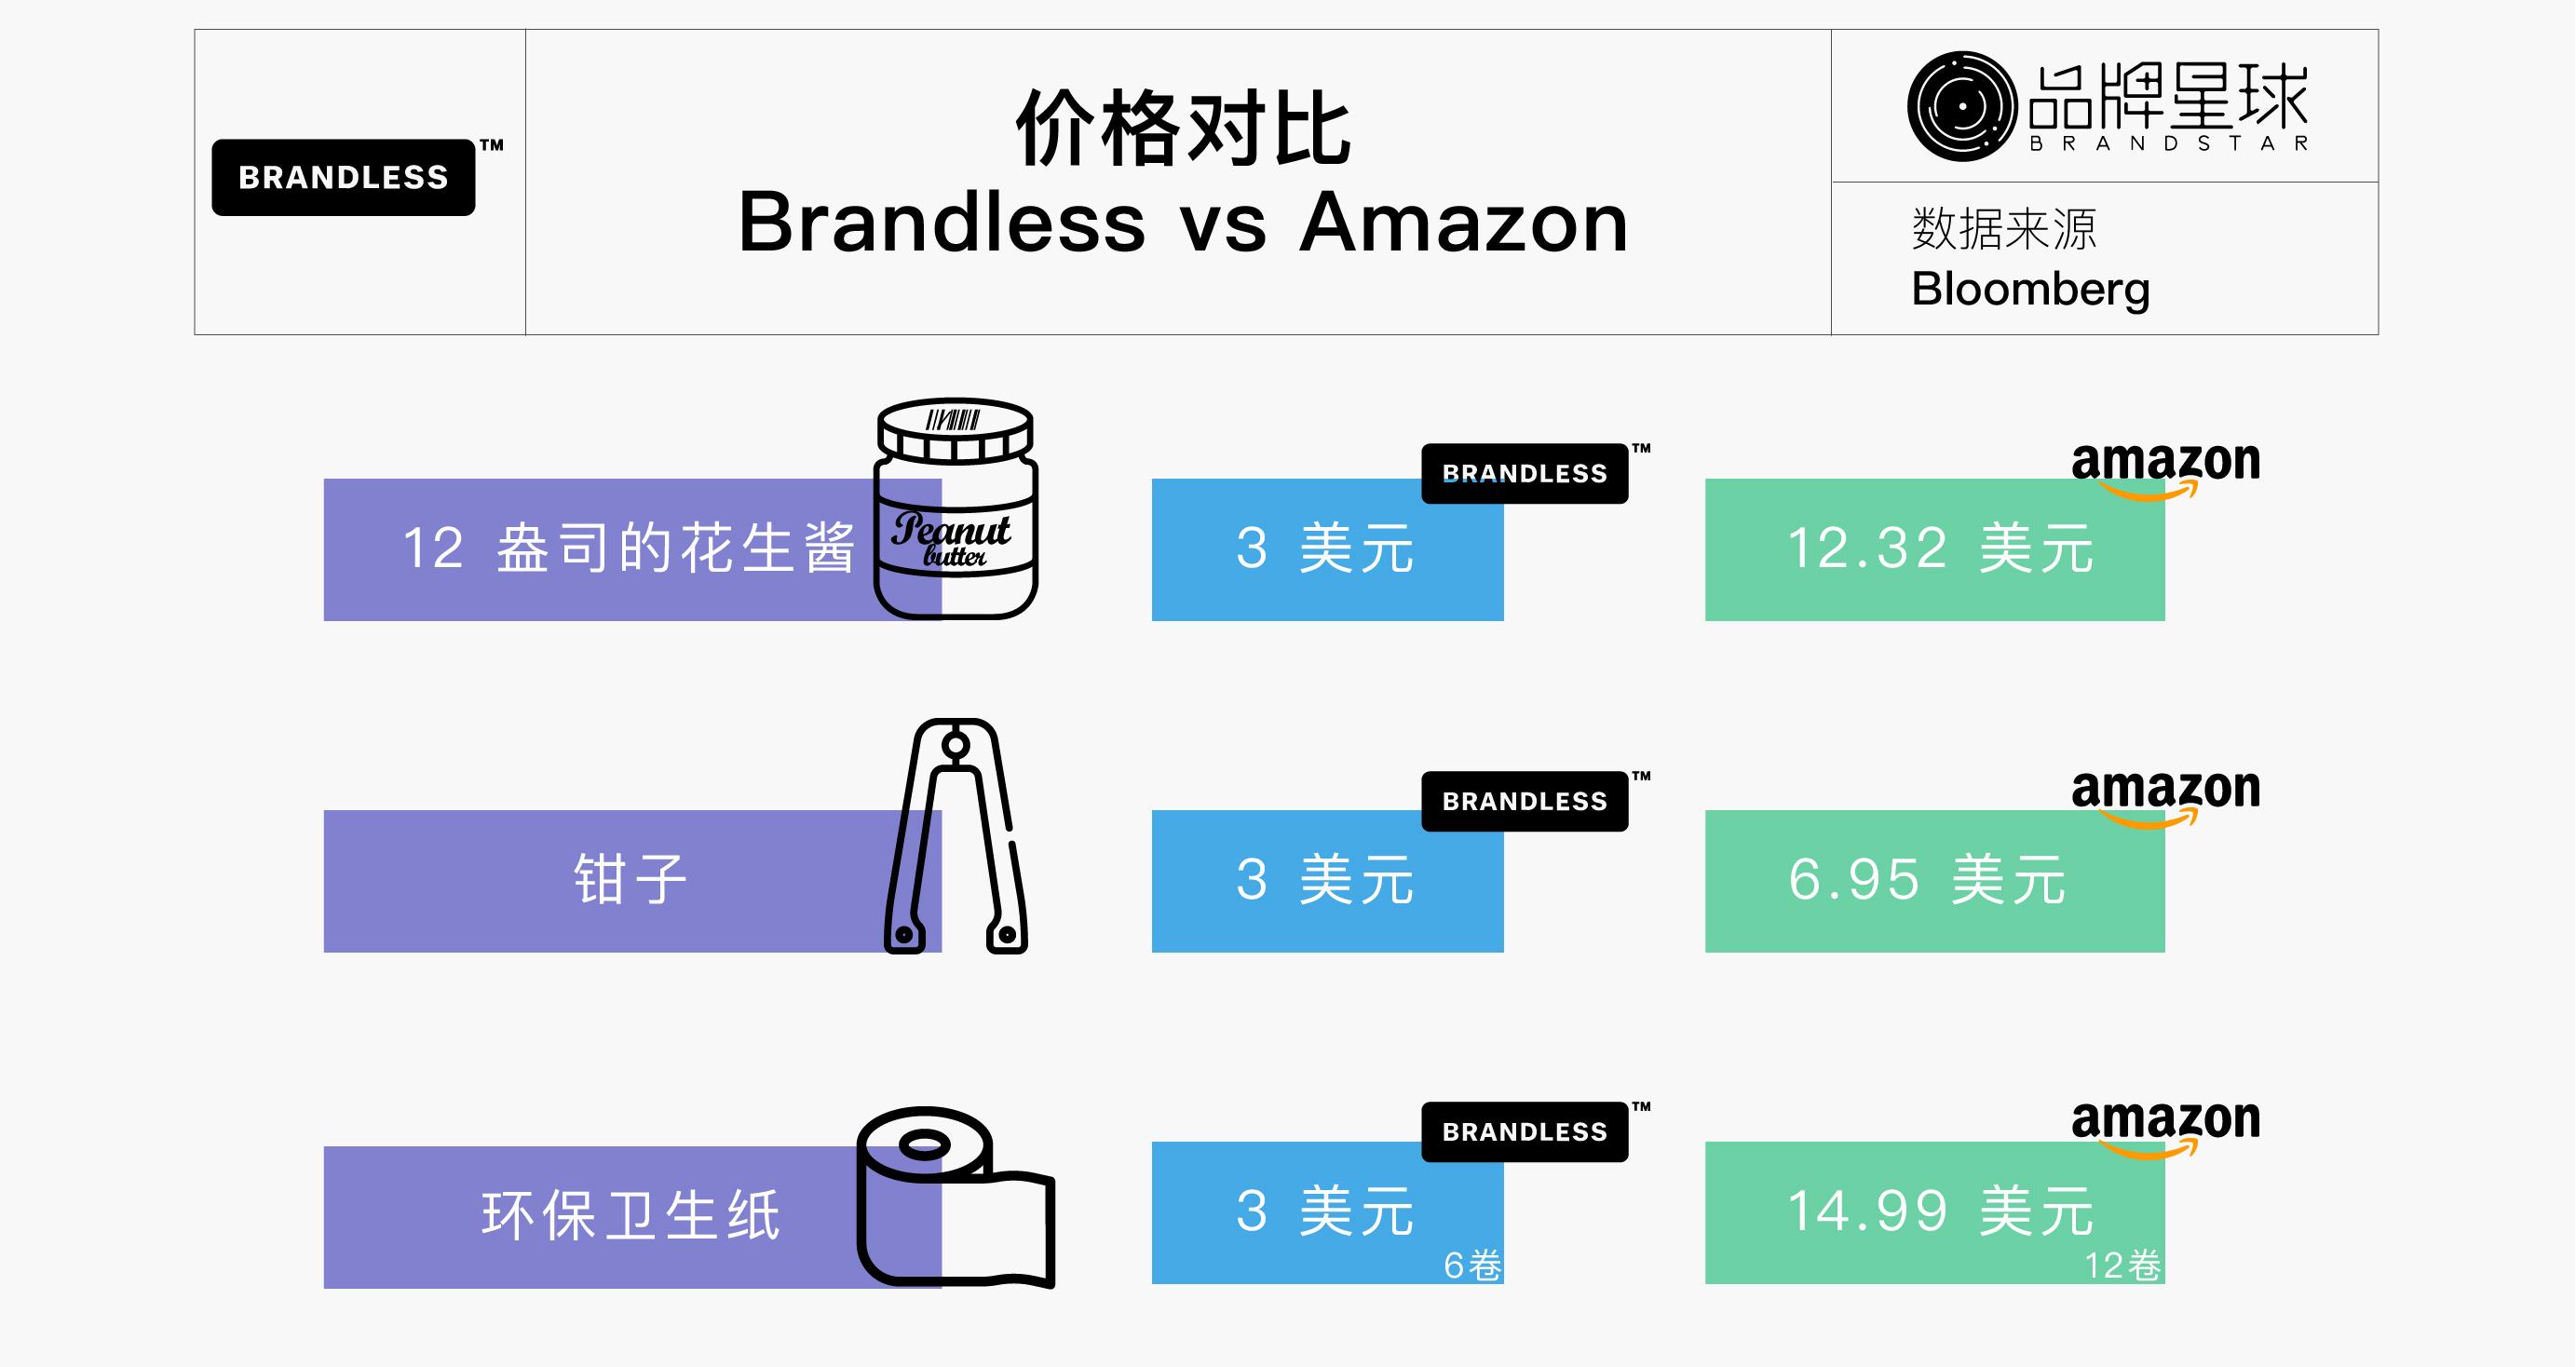 brandless 和 amazon 的价格对比